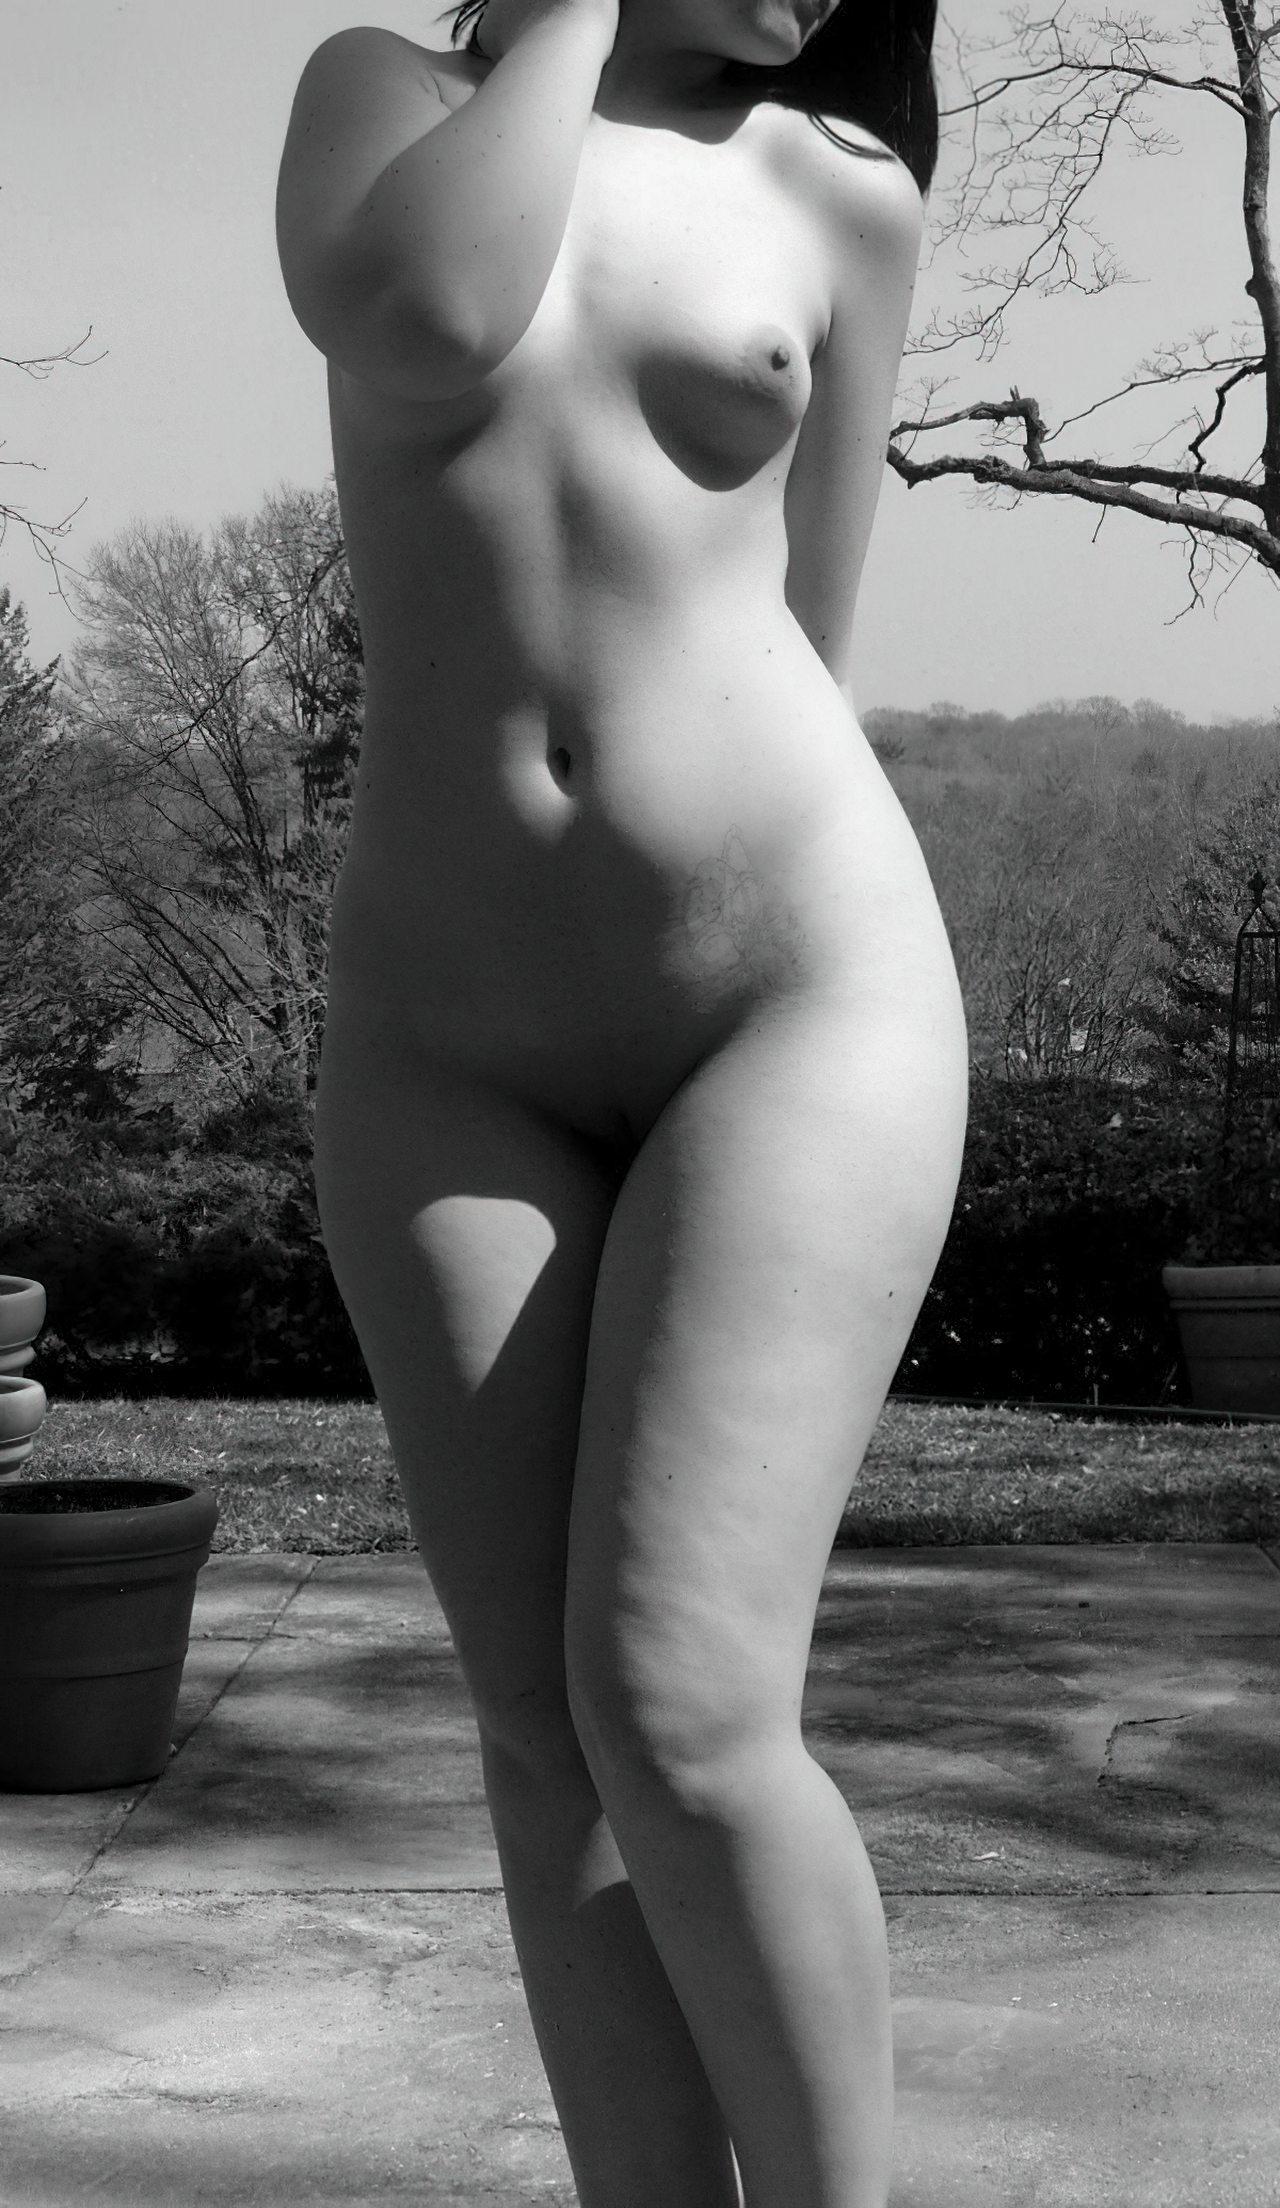 Sensualidade a Preto e Branco (13)